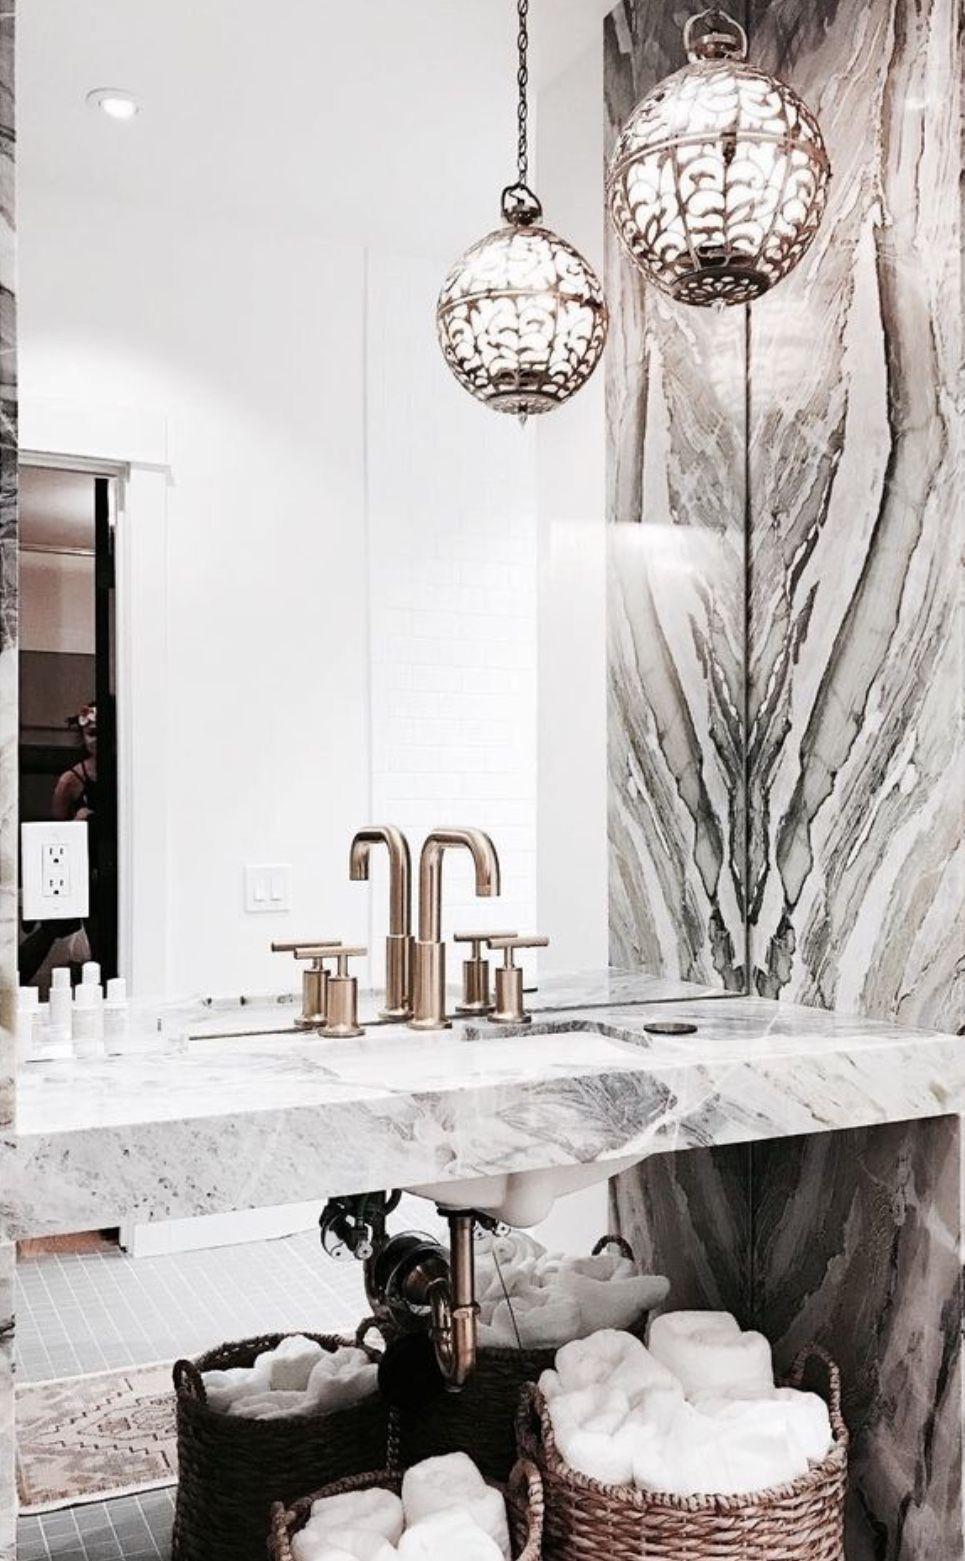 D life home interiors vickyygu  bathrooms in   pinterest  interior interior